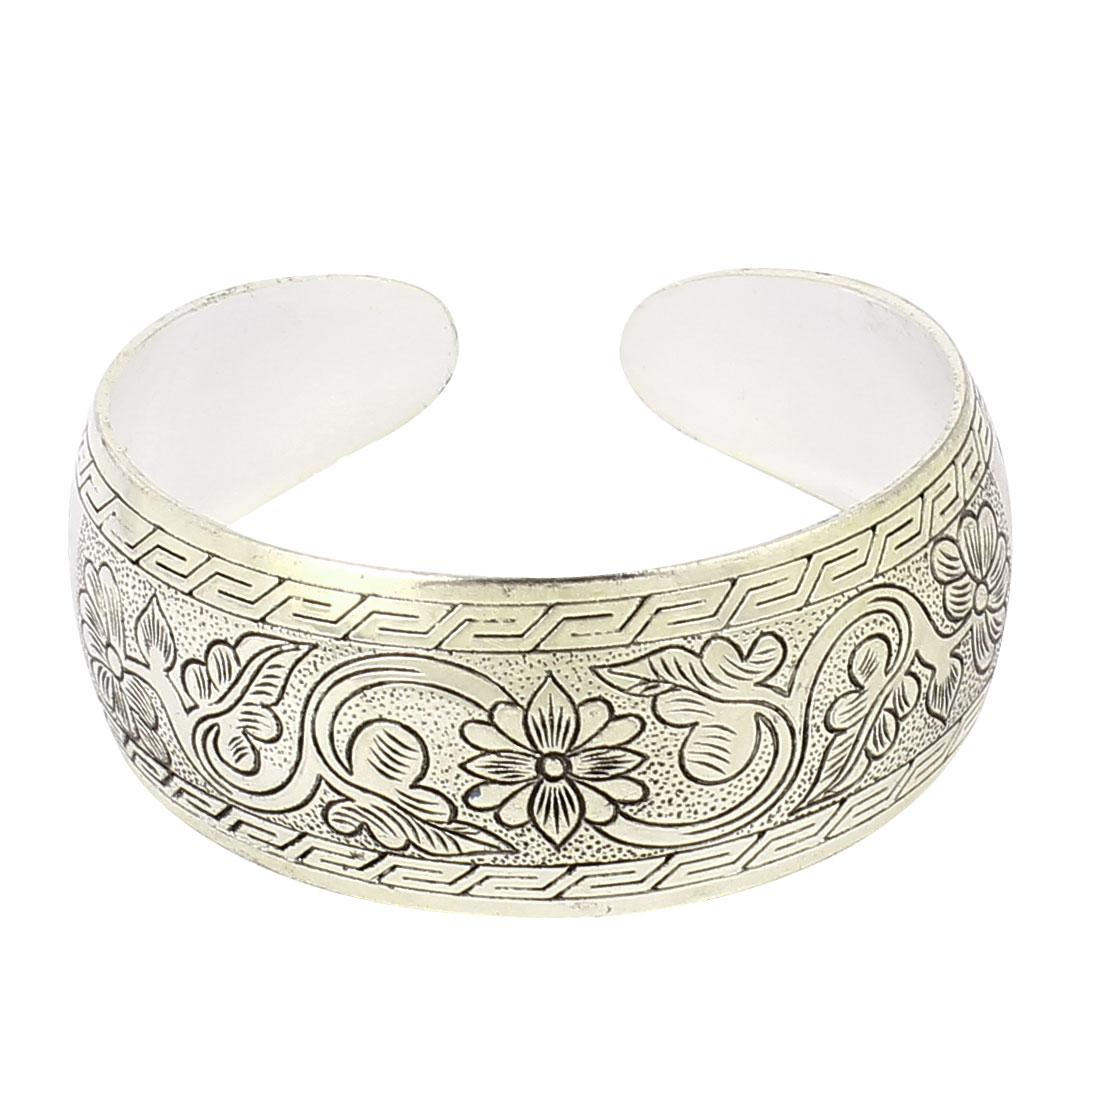 Lady Ethnic Style Carved Florals Wild Goose Pattern Wrist Cuff Bracelet Bangle